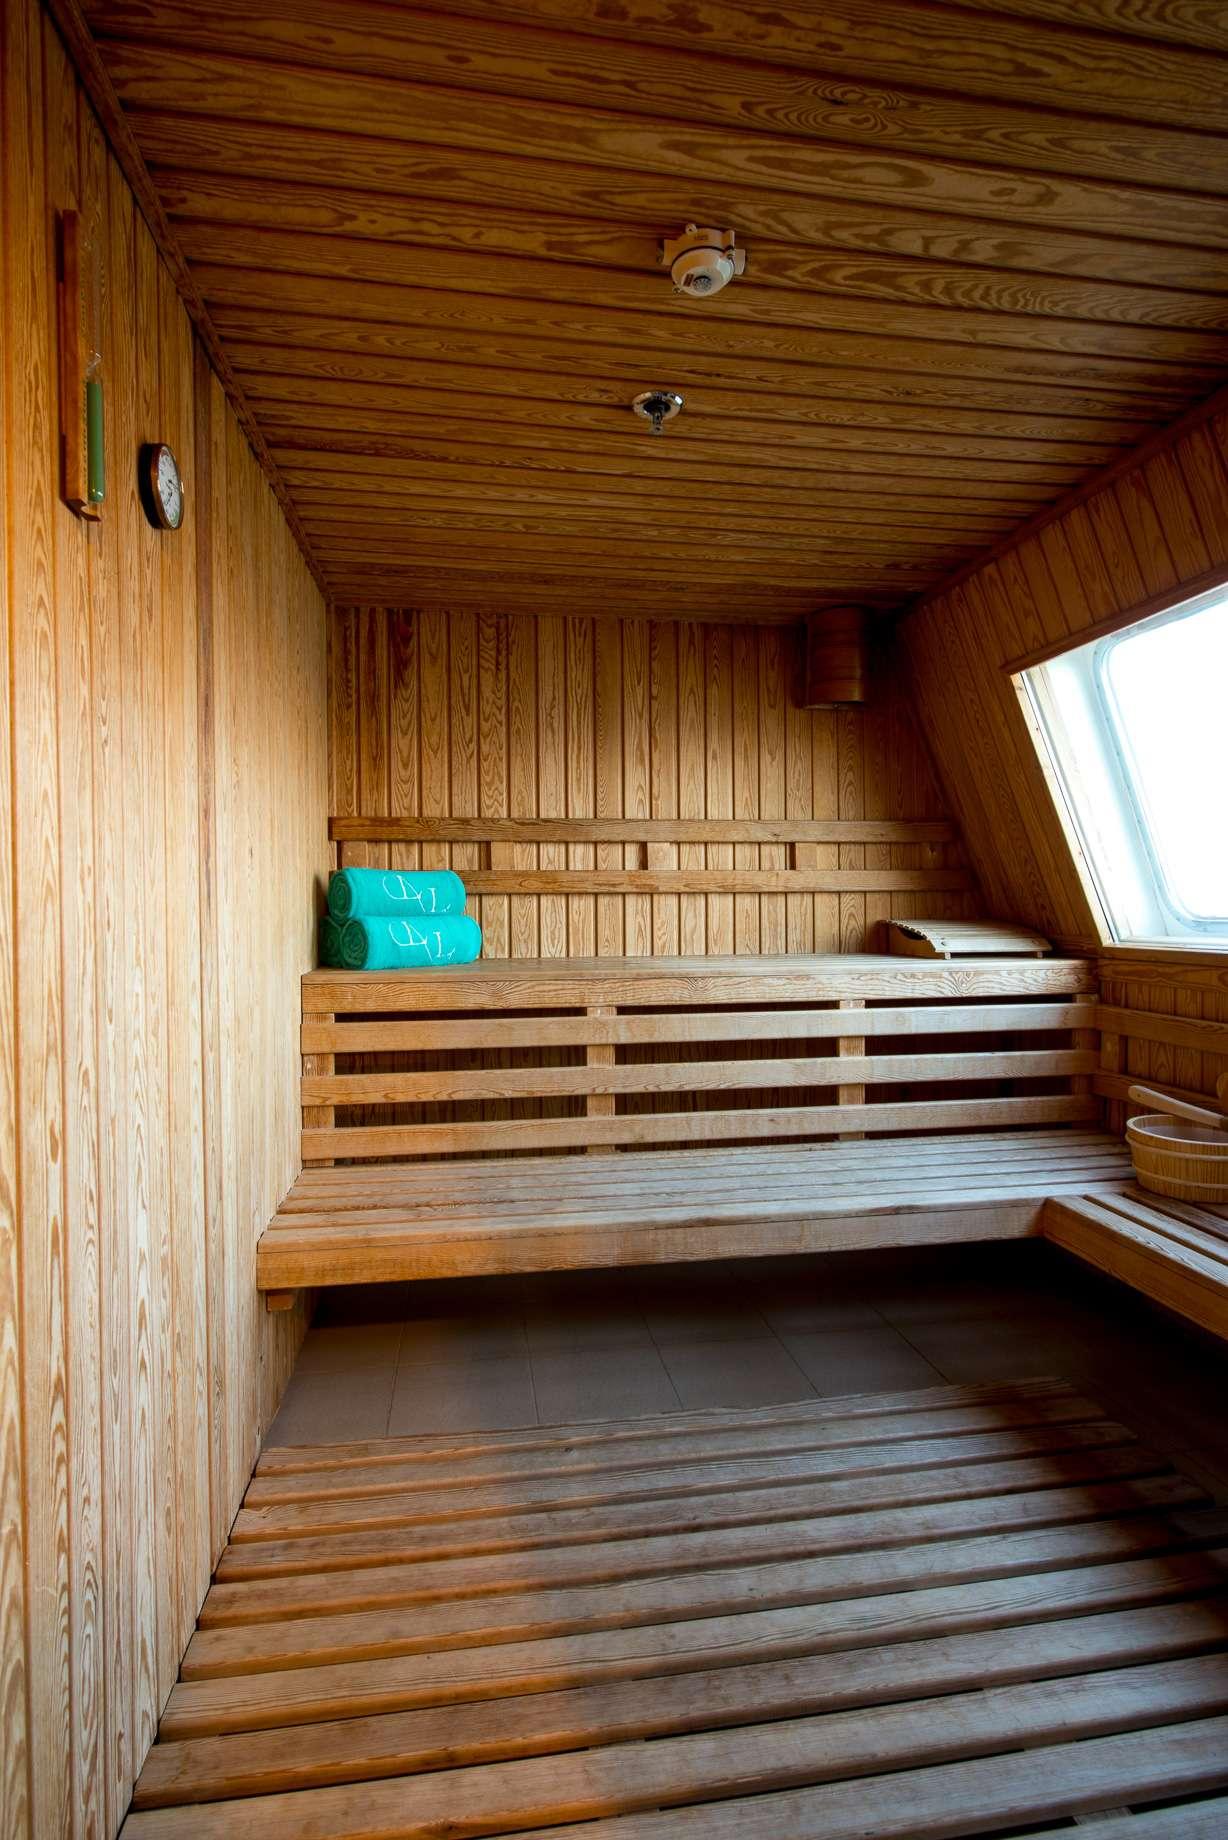 Motor Yacht 'LAUREN L' Sauna, 40 PAX, 295.00 Ft, 90.00 Meters, Built 2002, Cassens Werft, Refit Year 2008/2015